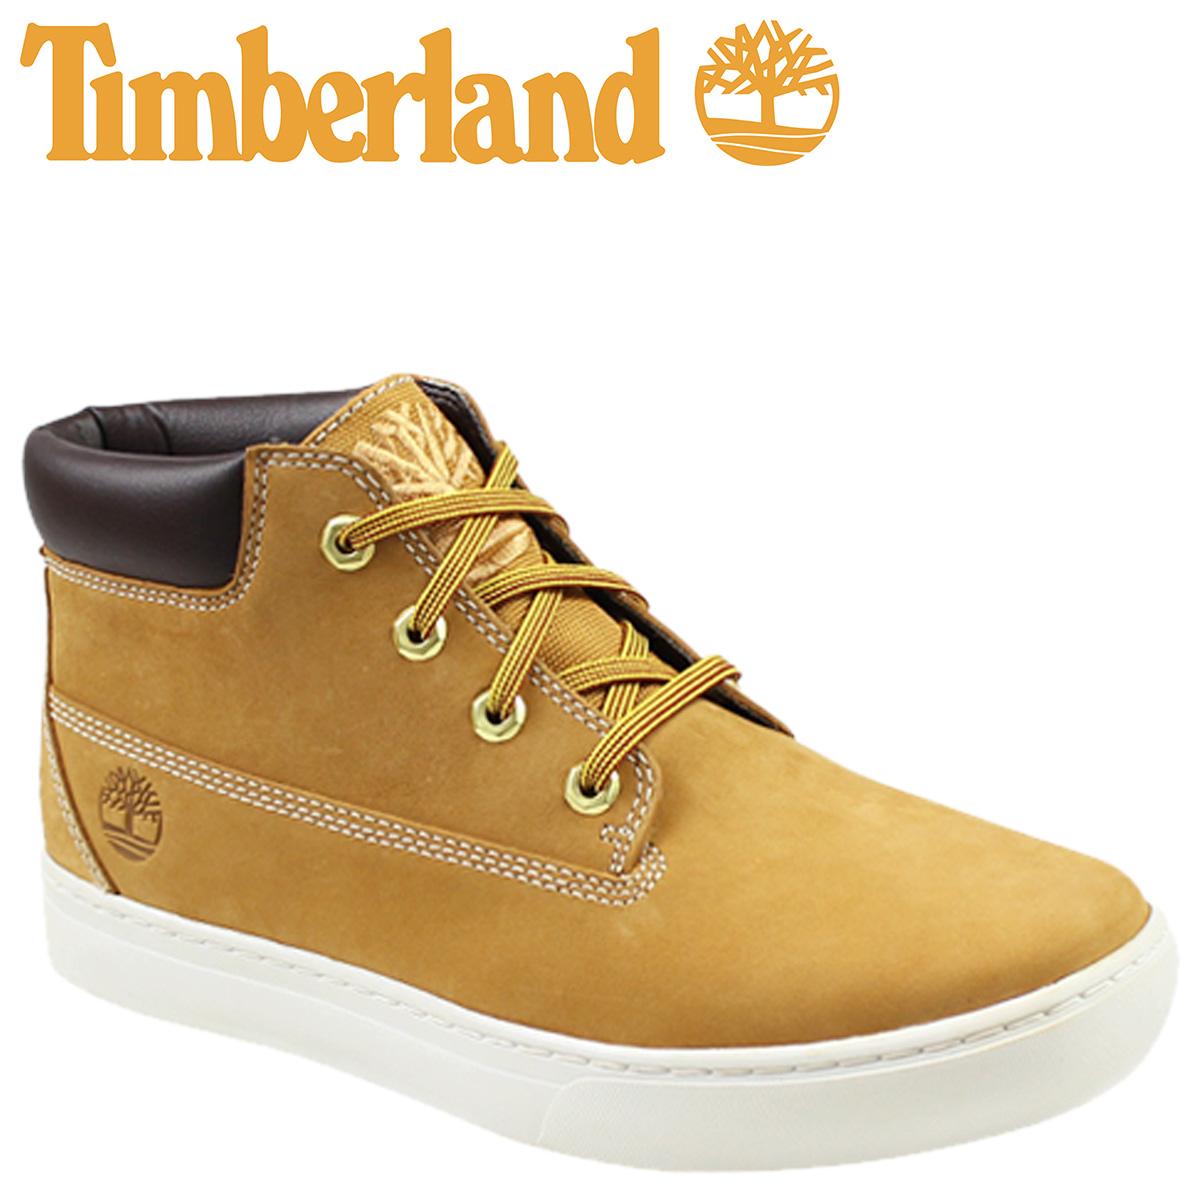 timberland cupsole chukka boot 2.0